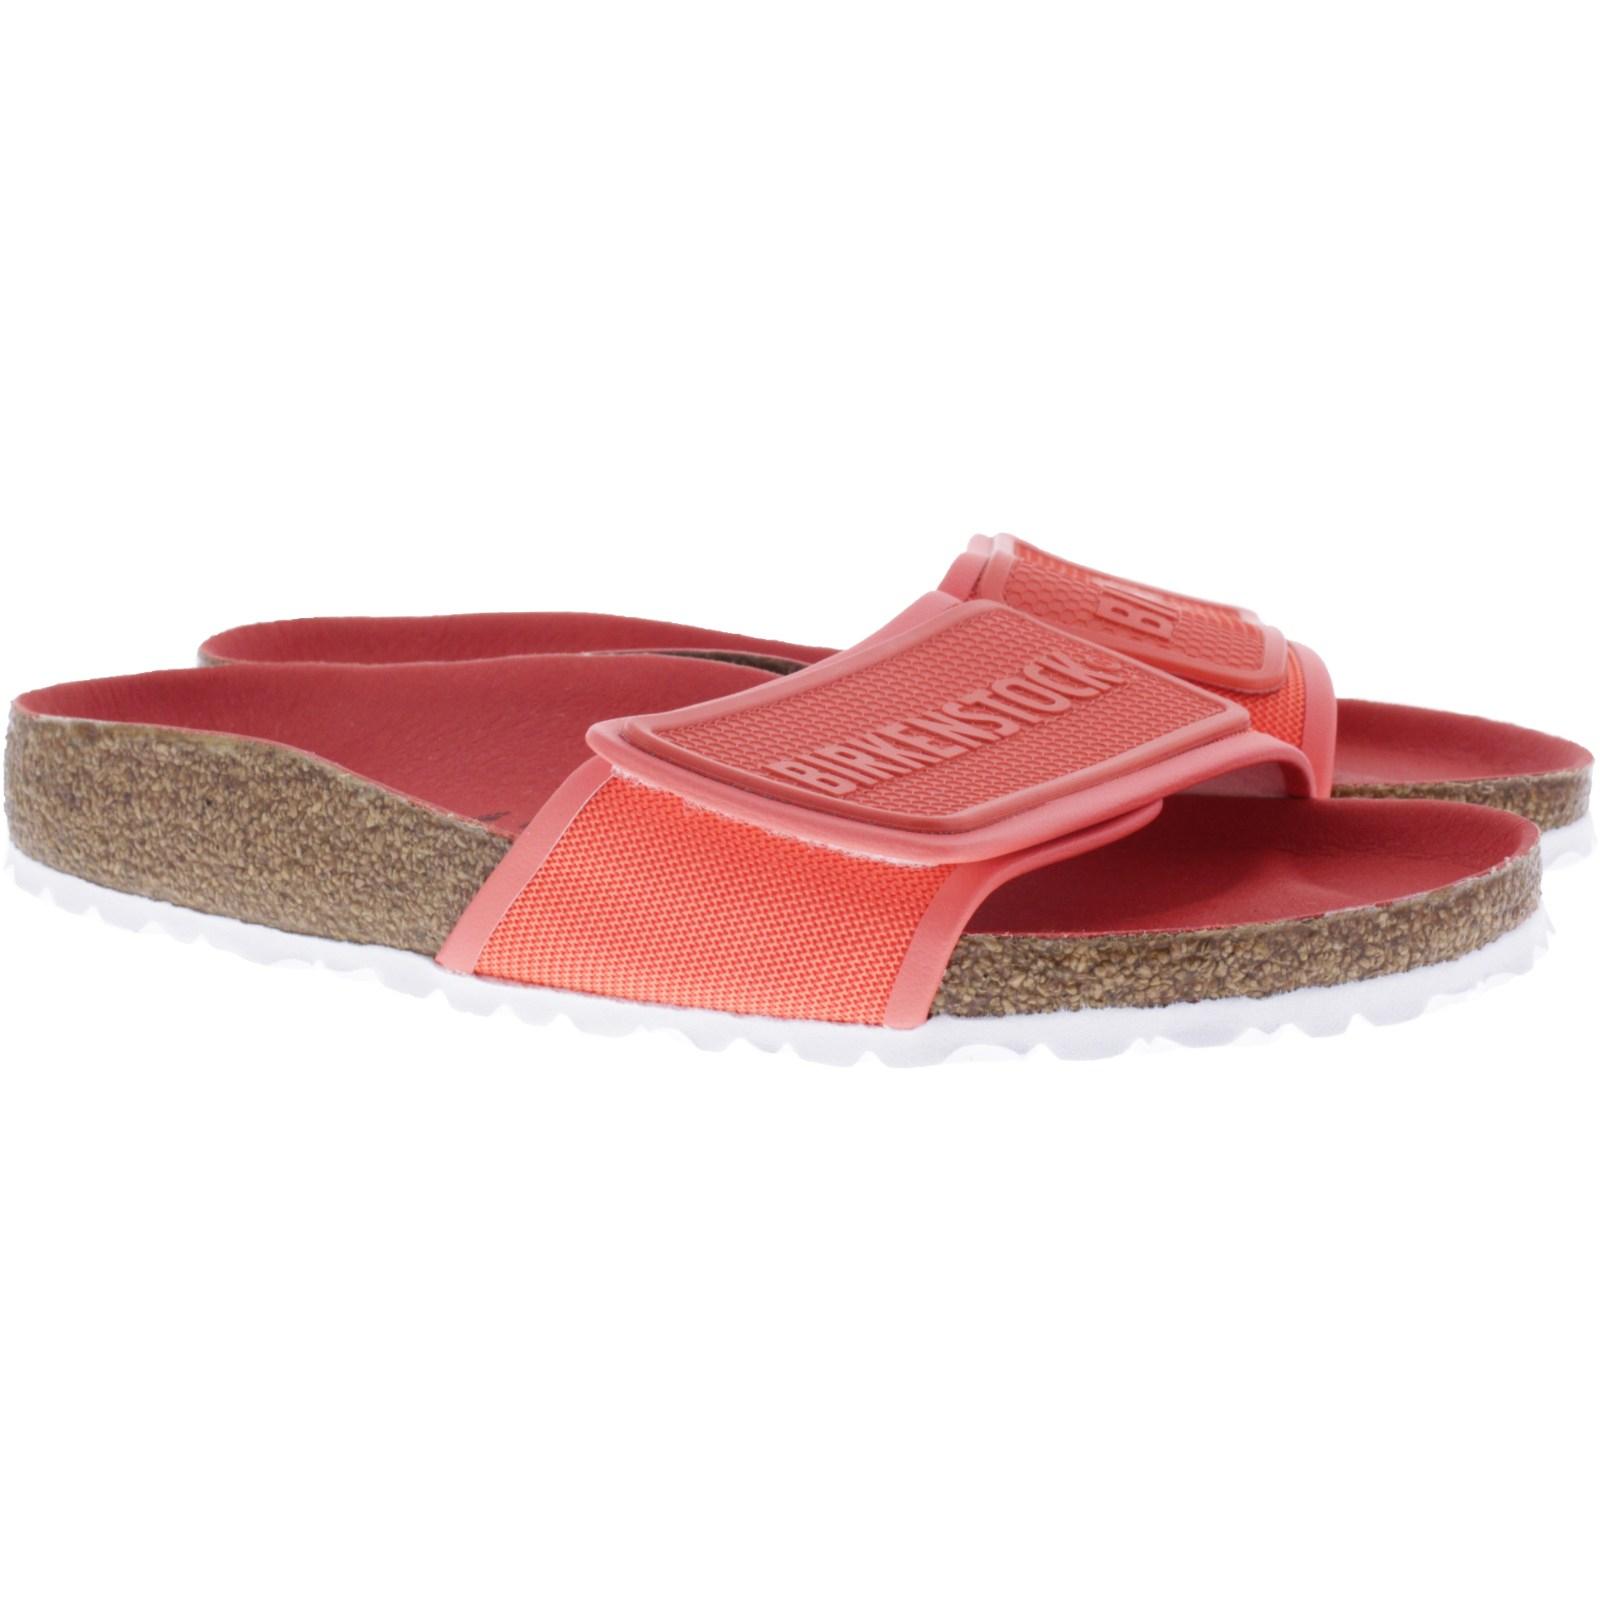 Birkenstock Modell: Tema Coral Rot Weite: Schmal Art: 1013231 Damen Pantoletten